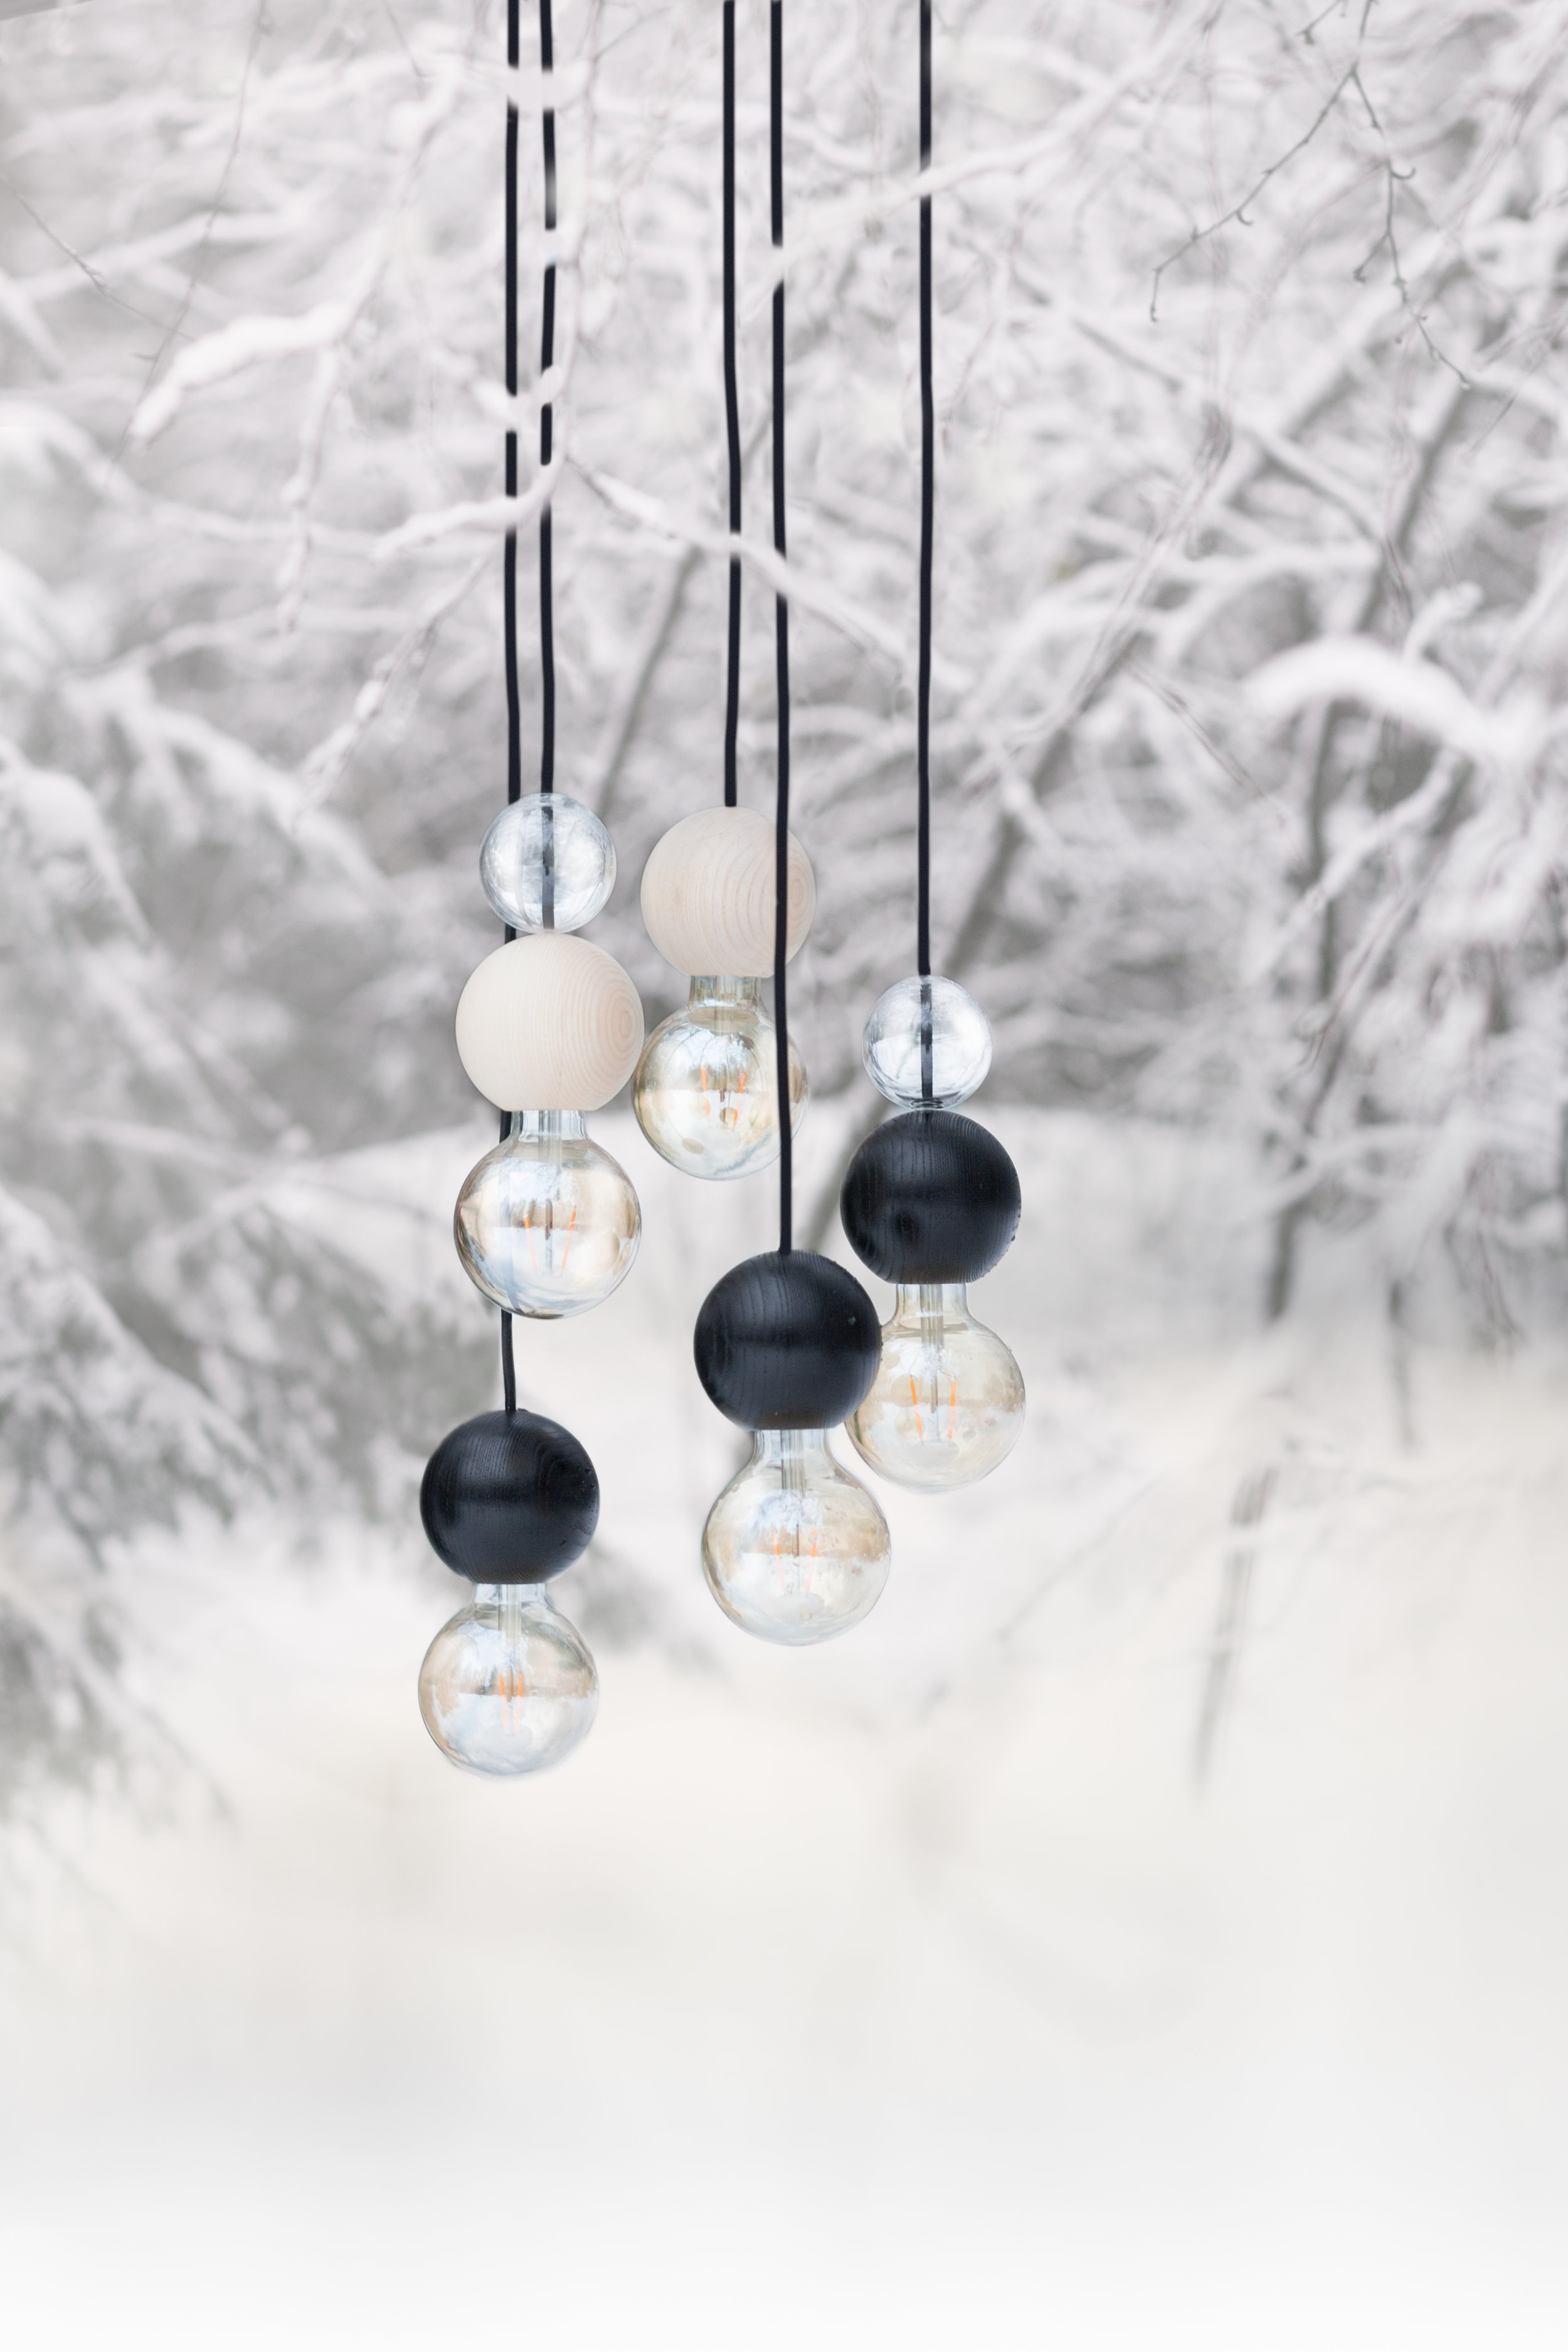 QUU Design, snow,jpg.jpg